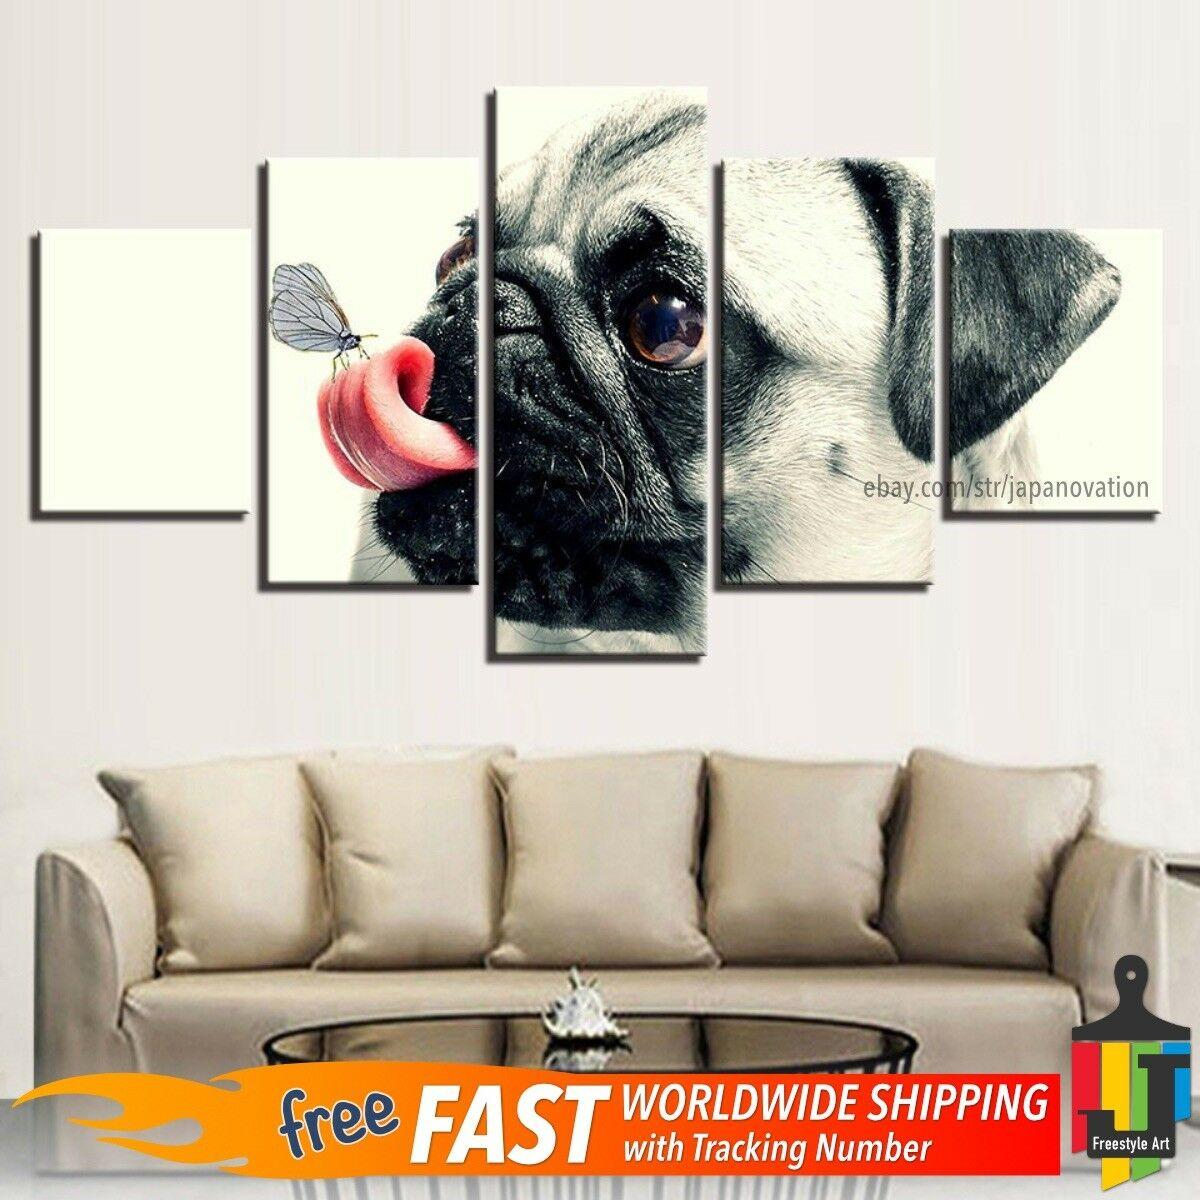 5 Pieces Home Decor Canvas Print Animal Wall Art Cute Pet Pug Dog Play Butterfly